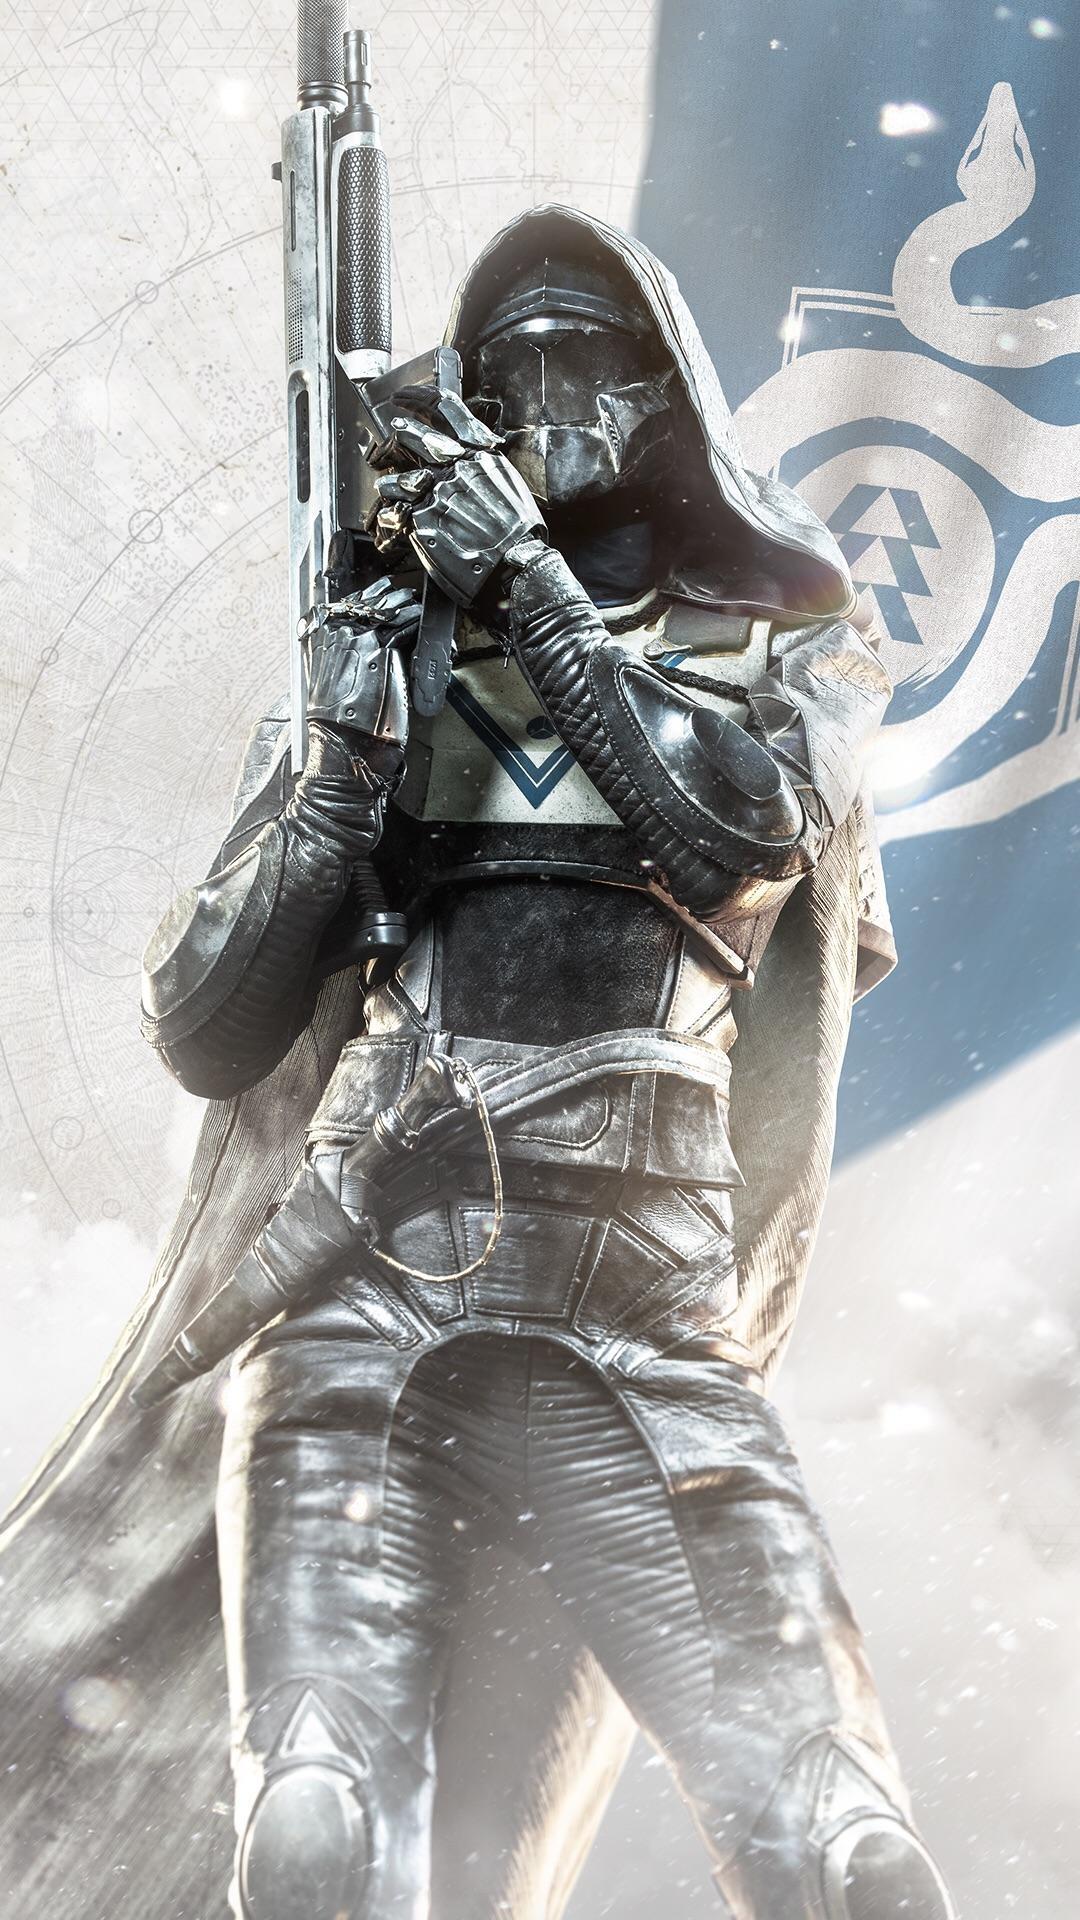 Destiny 2 – Hunter smartphone wallpaper